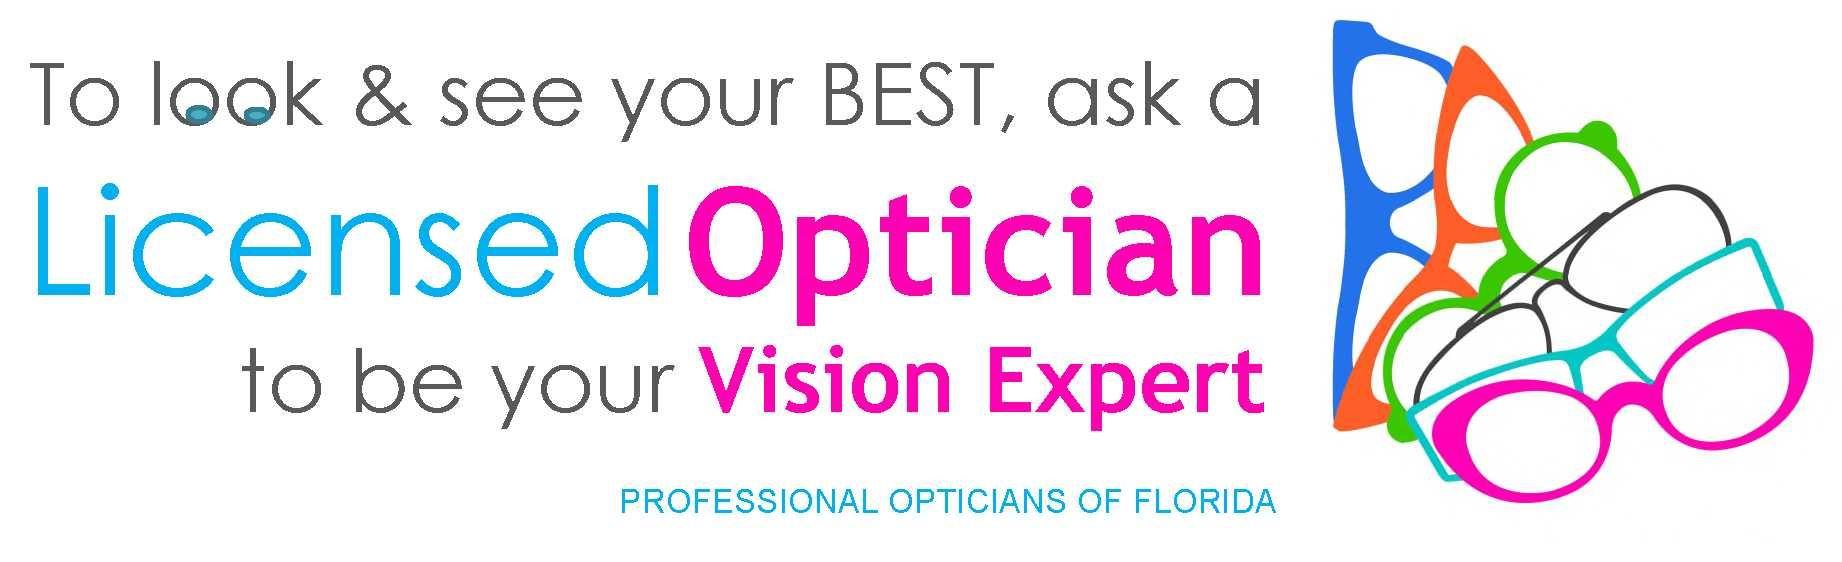 Professional Opticians Of Florida Consumer Info